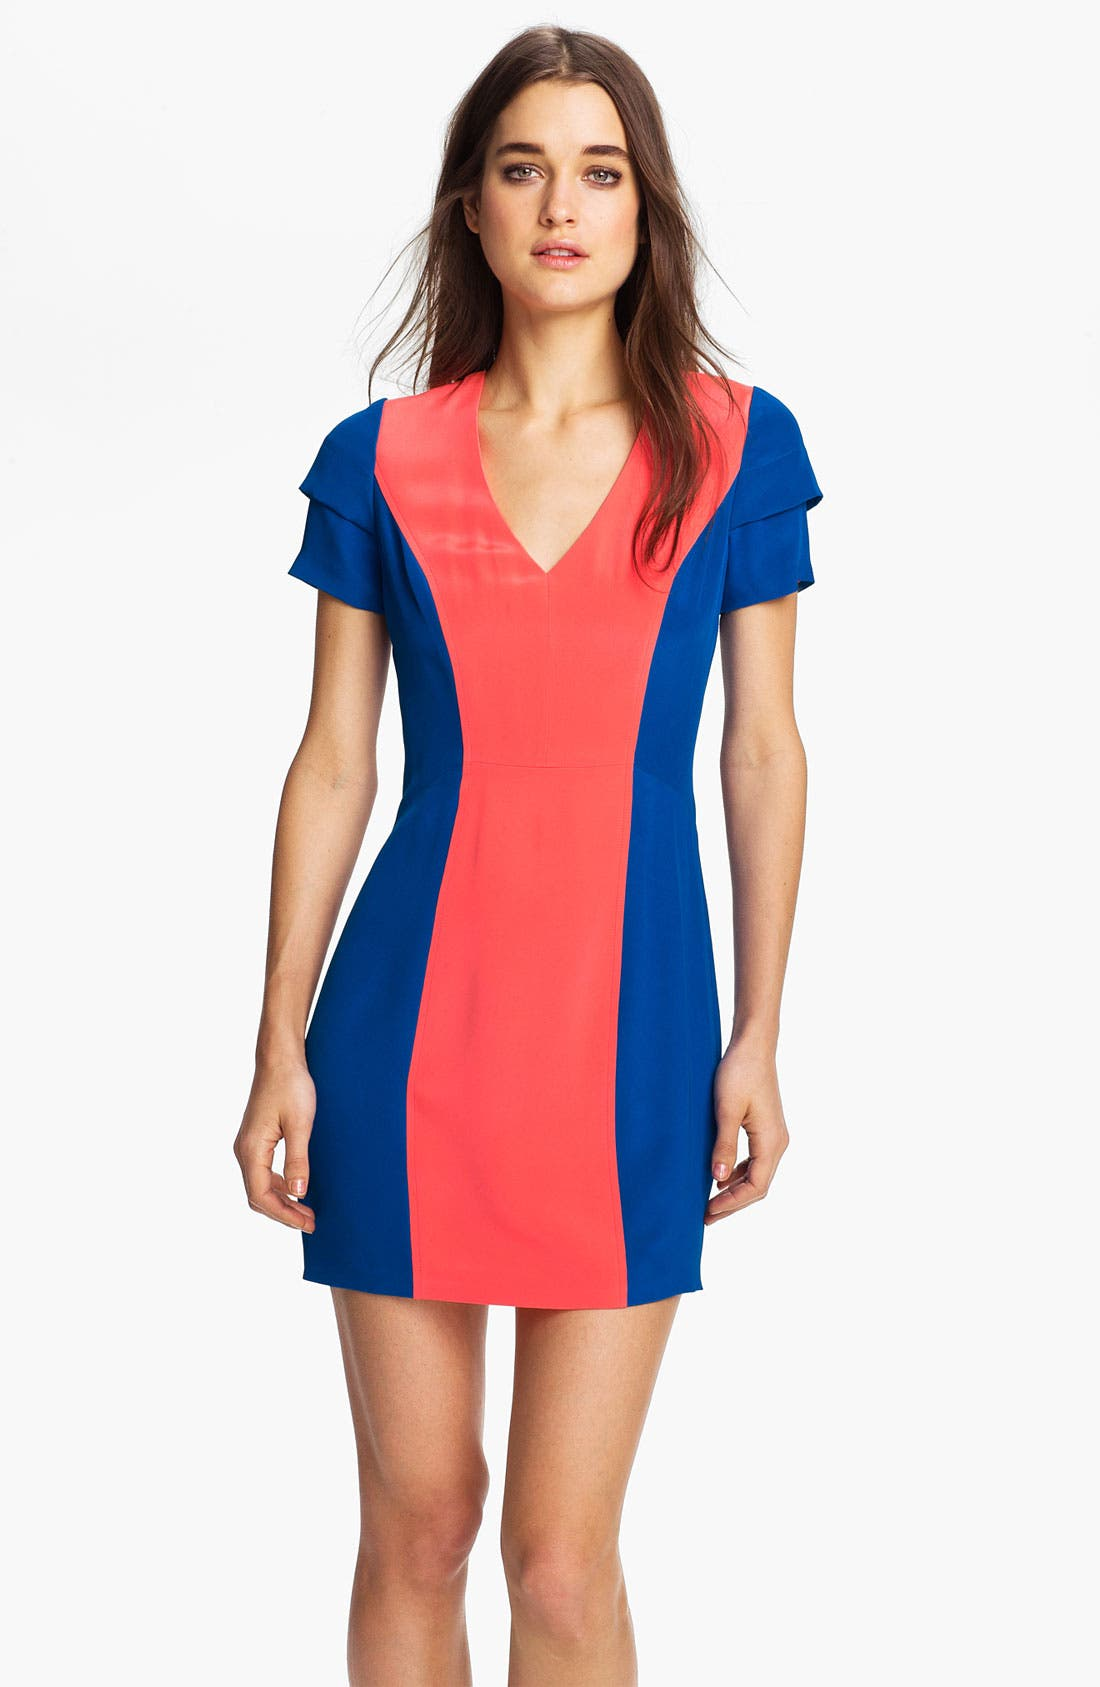 Alternate Image 1 Selected - Rebecca Minkoff 'Katya' Colorblock Silk Dress